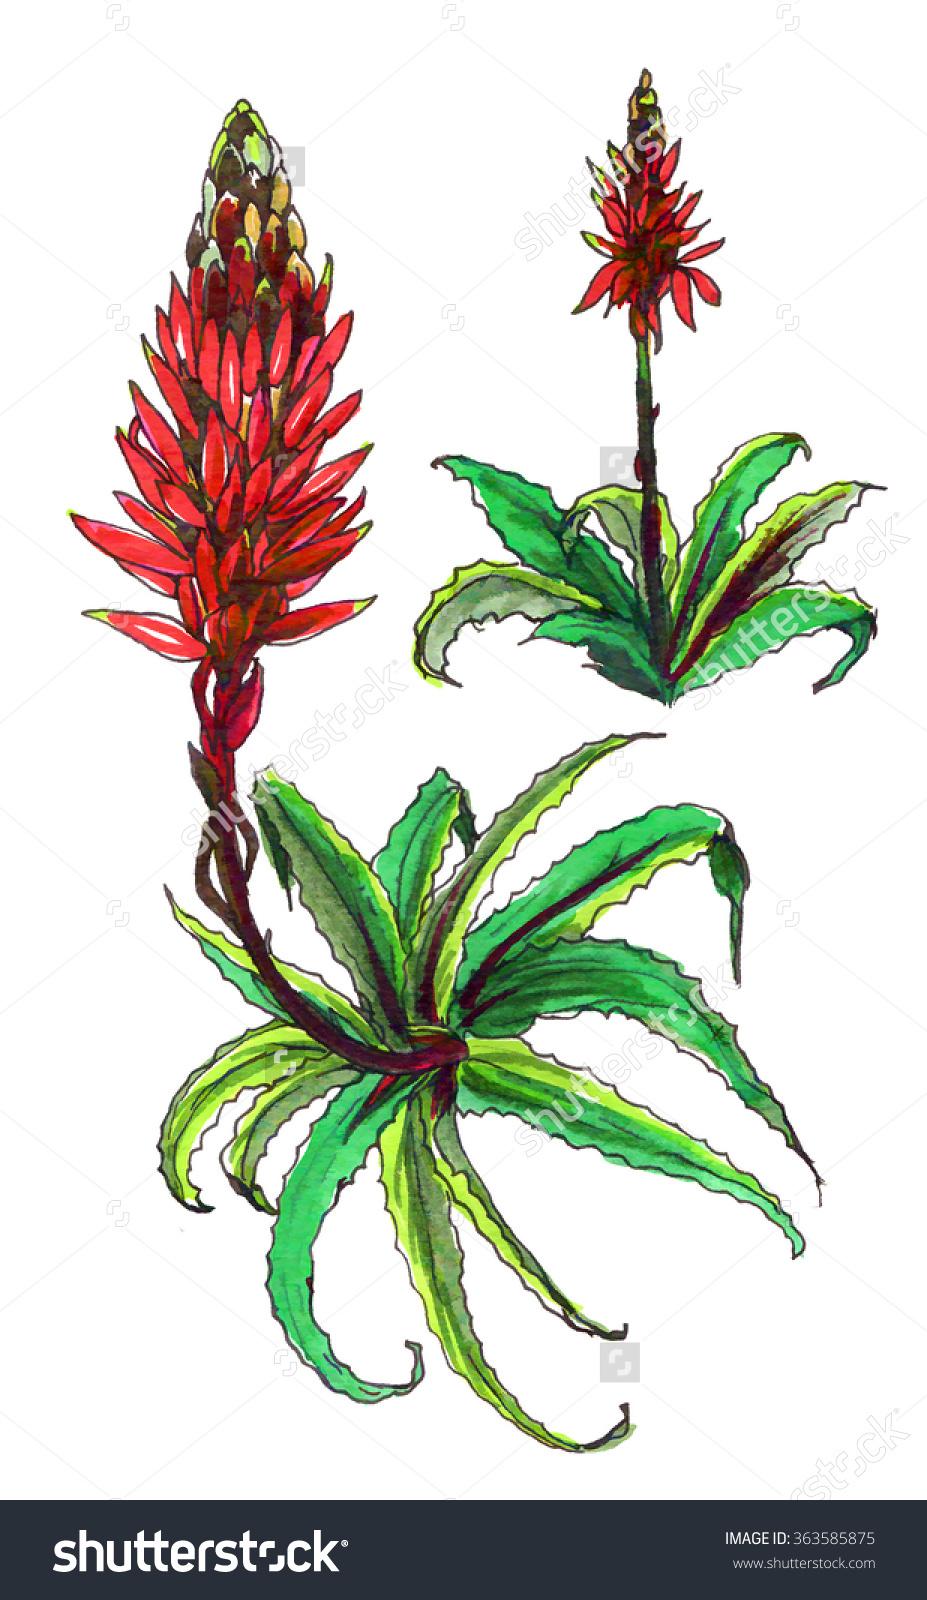 Decorative Red Aloe Vera Cactus Blossom Stock Illustration.